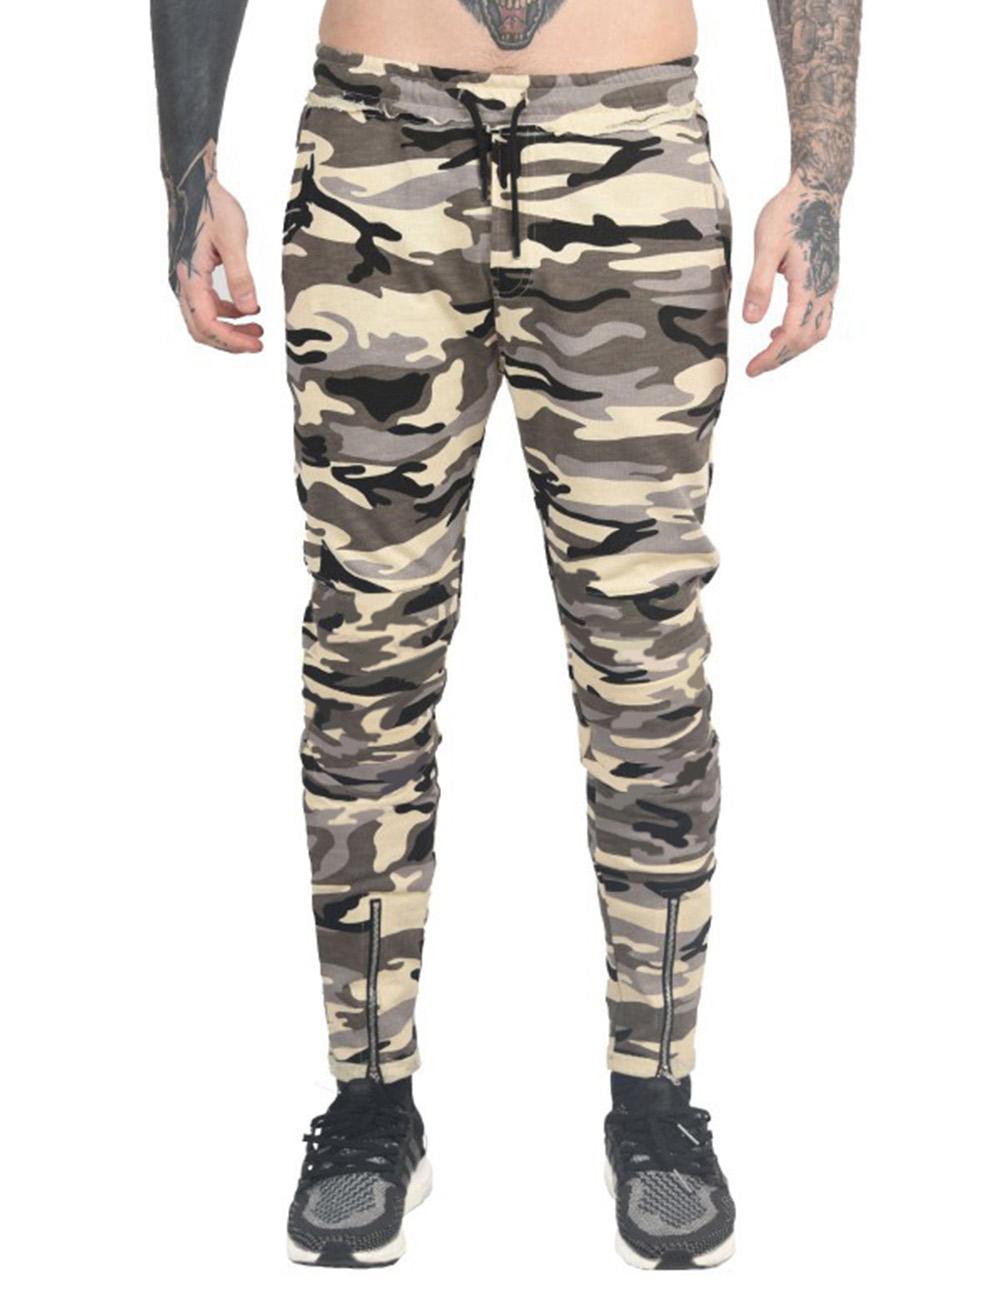 Stylish Men Camouflage Sports Trousers with Zipper Leg Opening Elastic Band Waist Long Pants Gift Yellow Camo_L